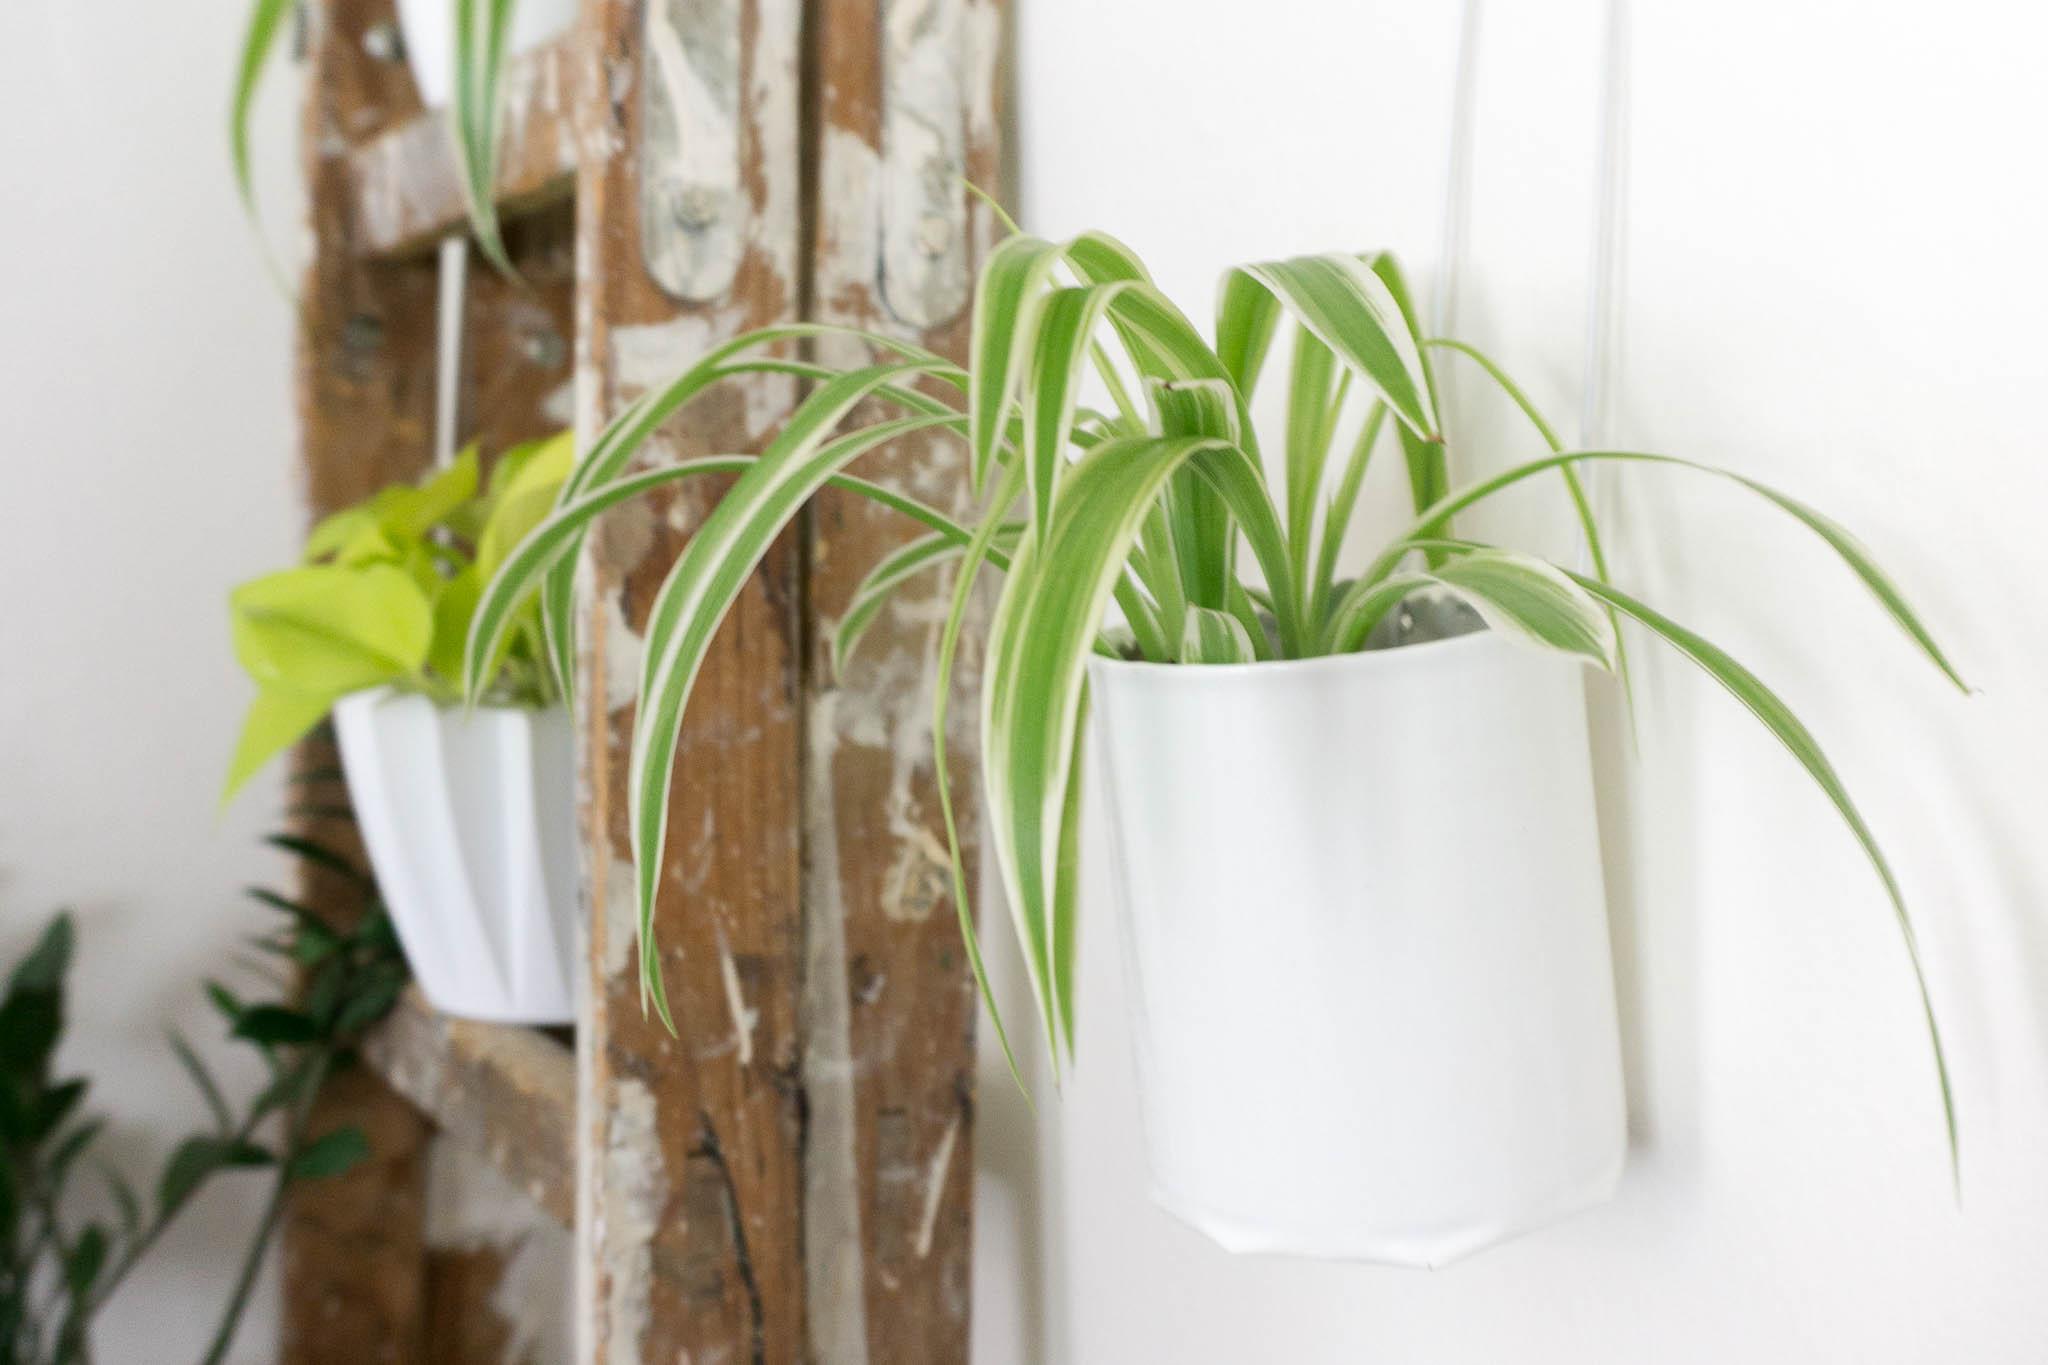 pflanzen an die wand hängen - diy inddor garden - urban jungle